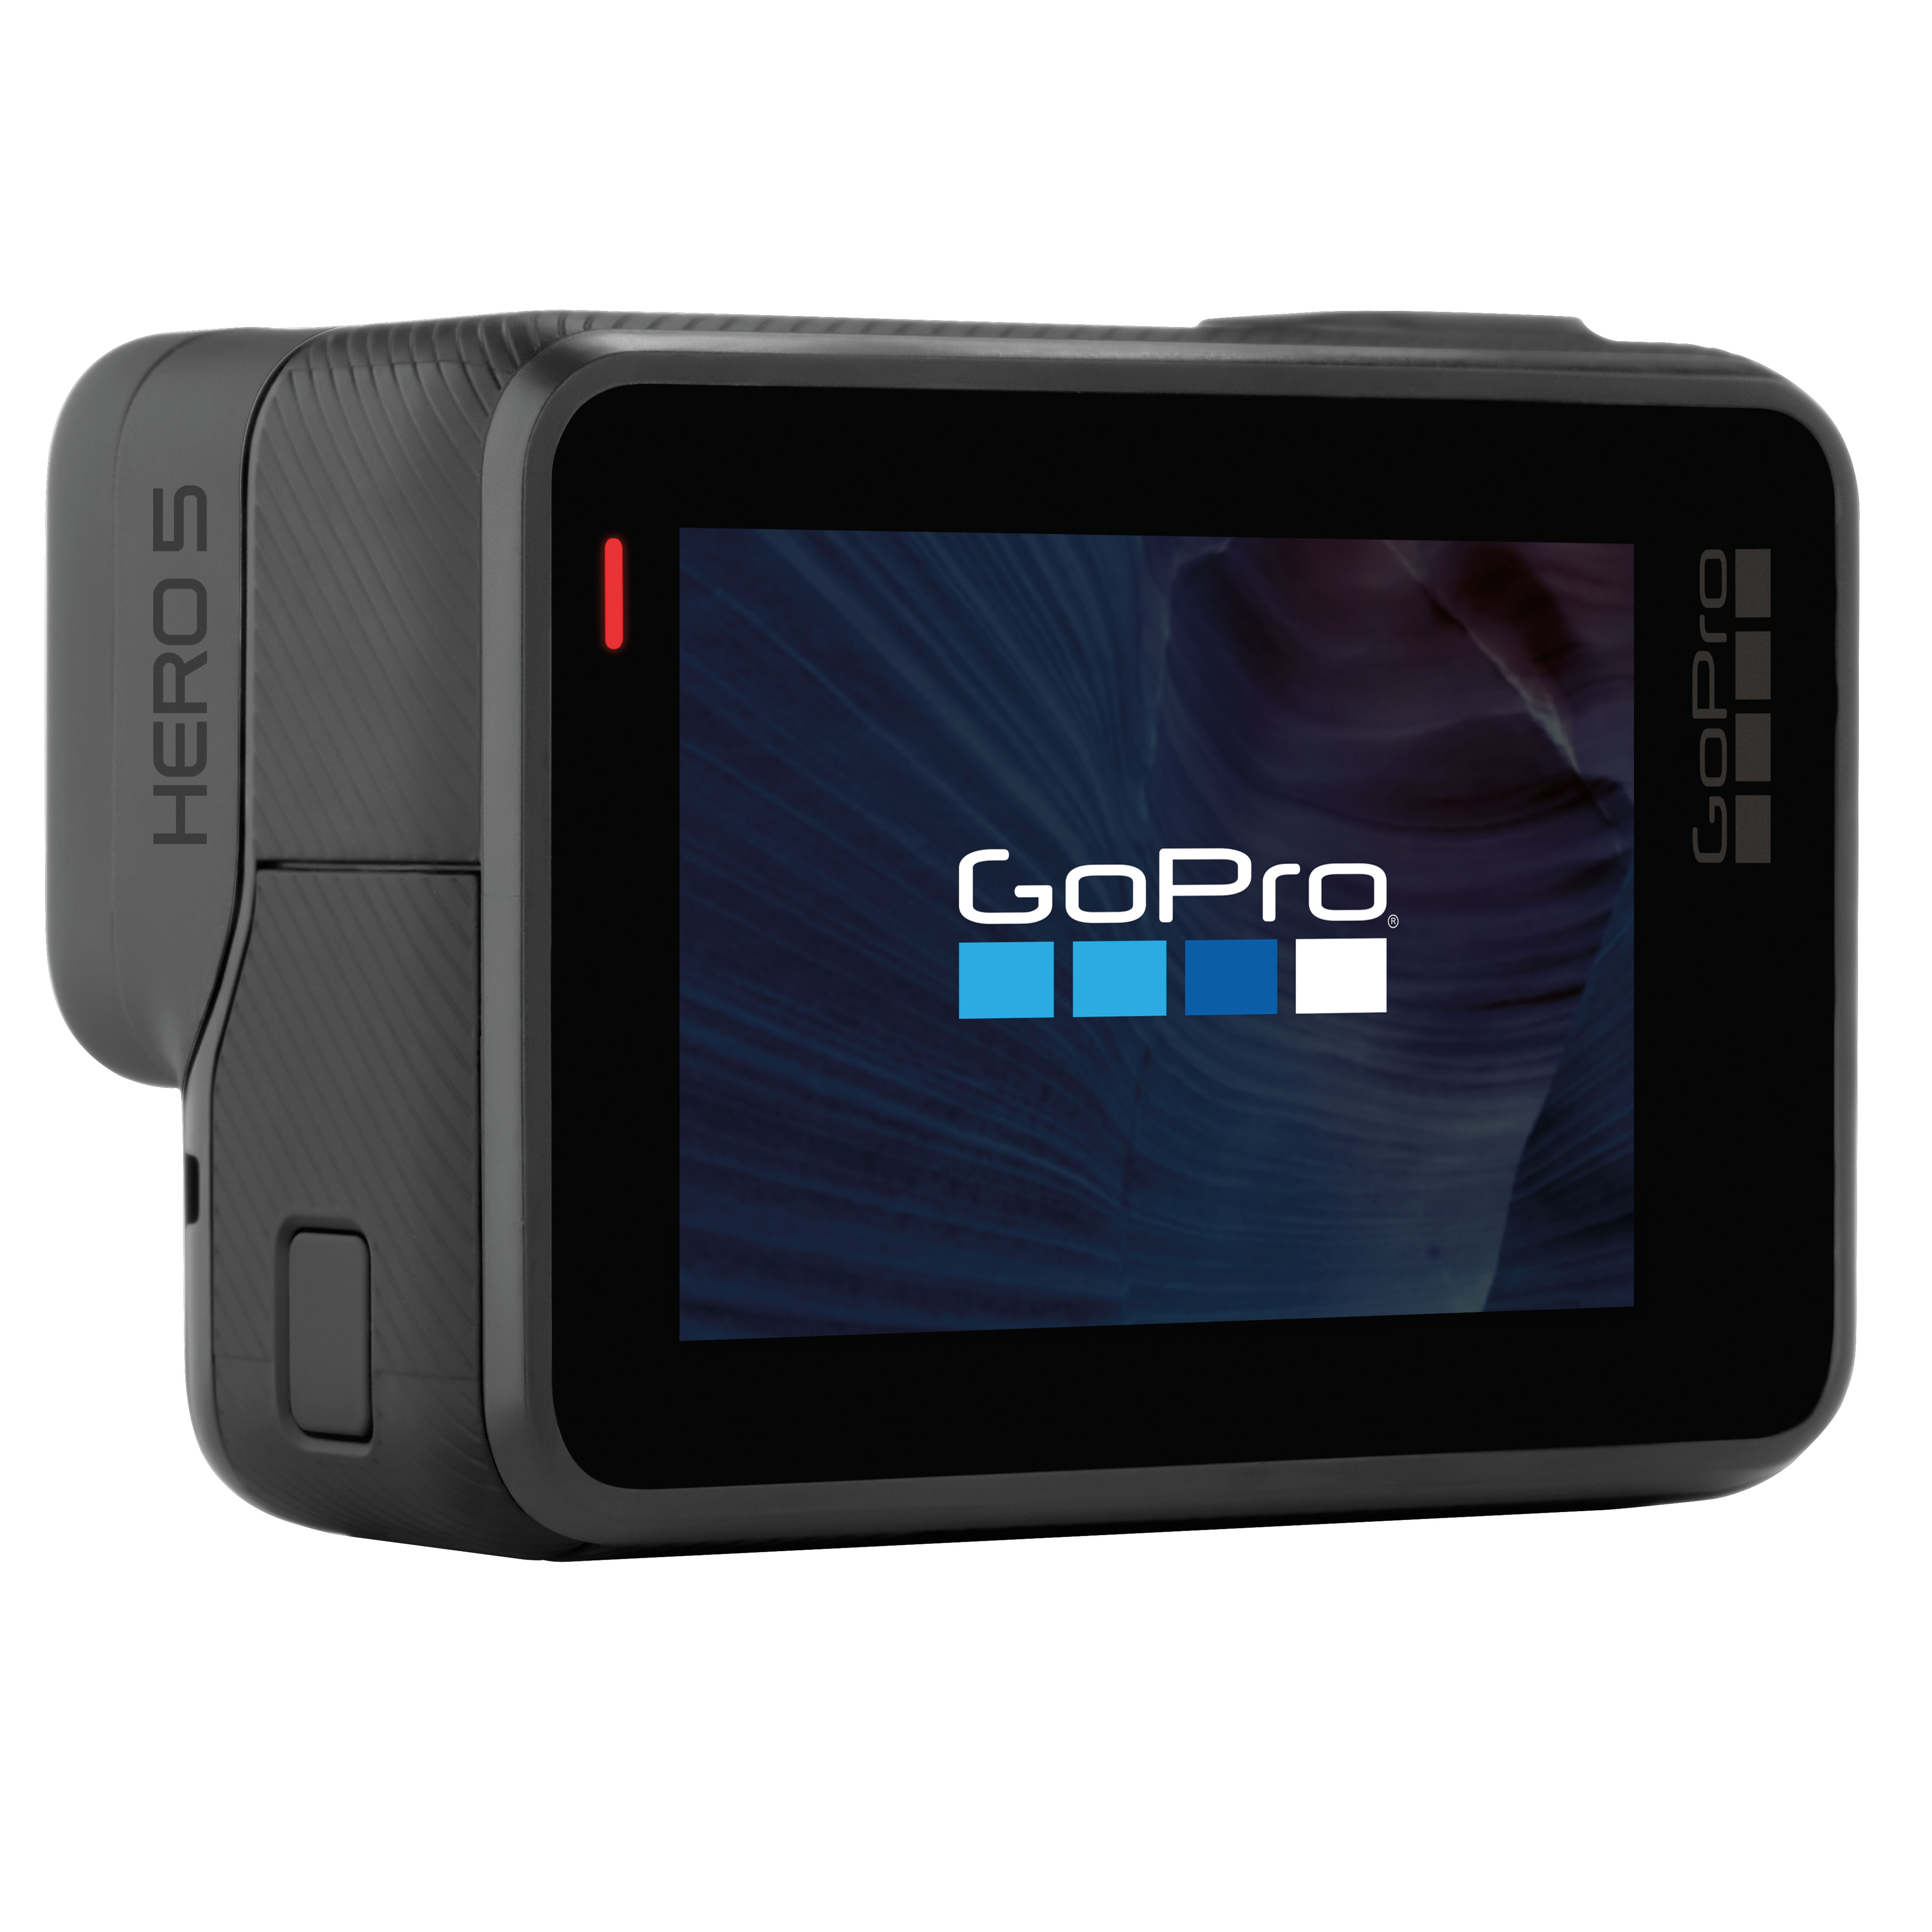 camera link frame grabber with fpga image processing DWsQ